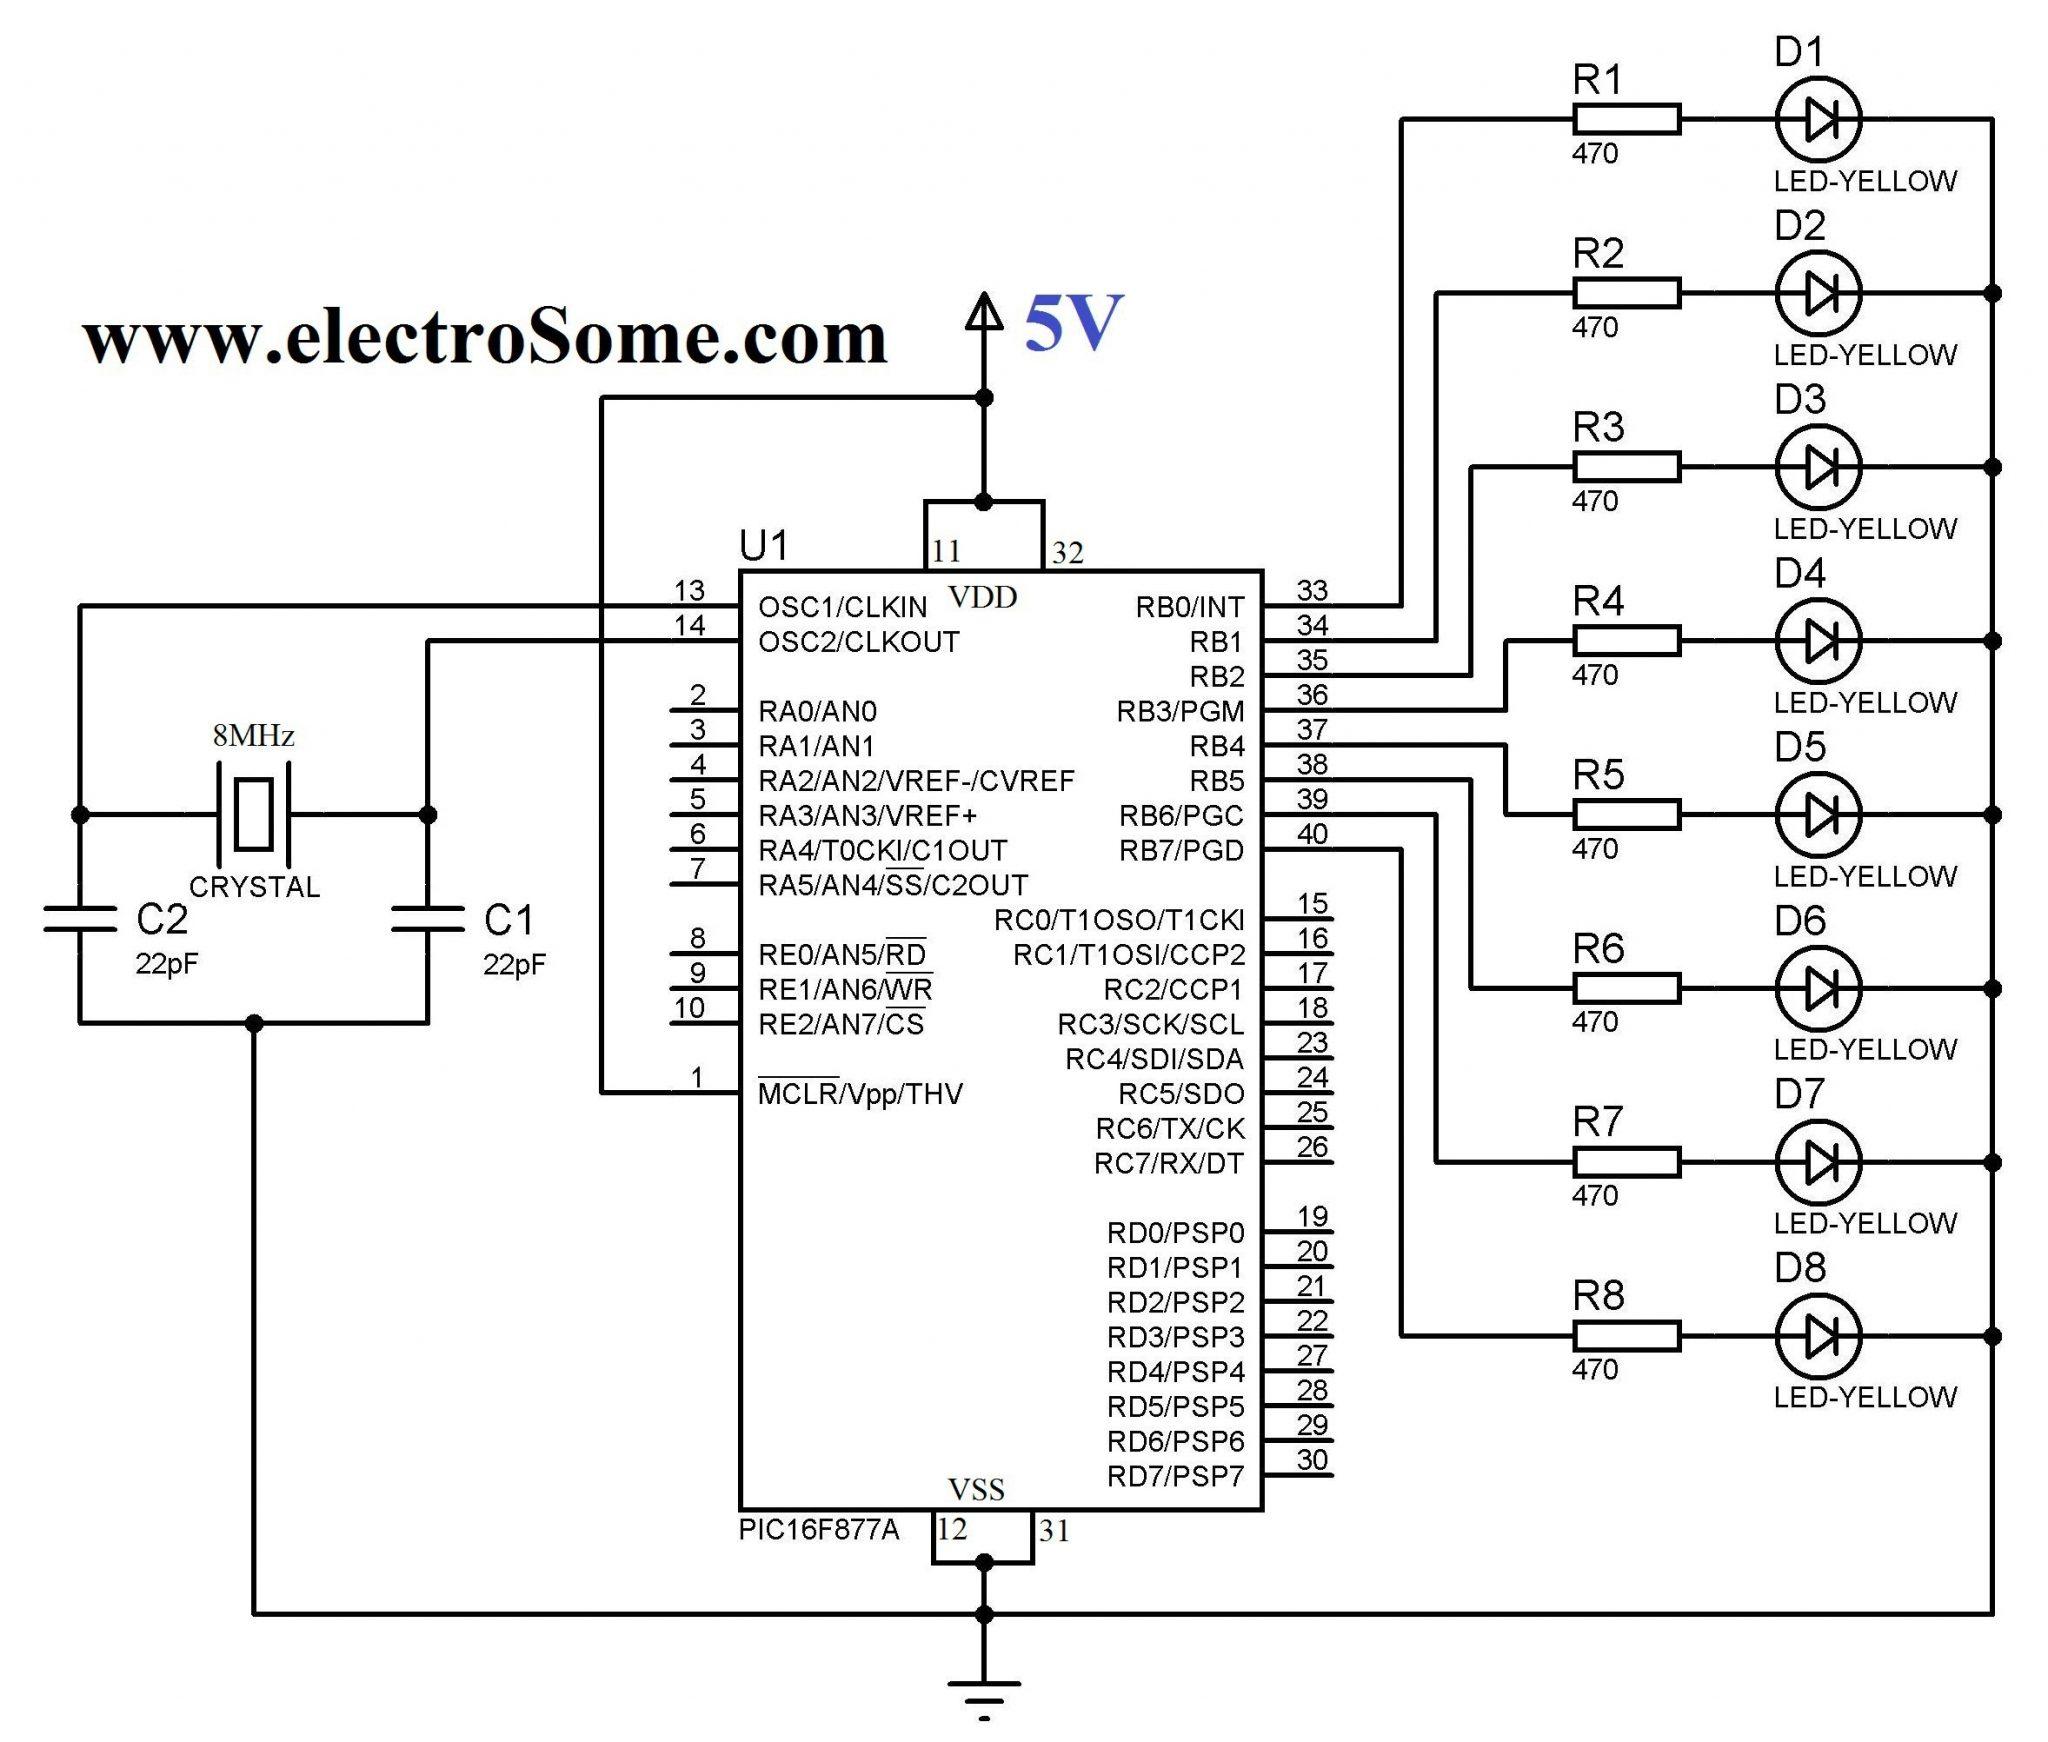 Blinking led using pic microcontroller circuit diagram